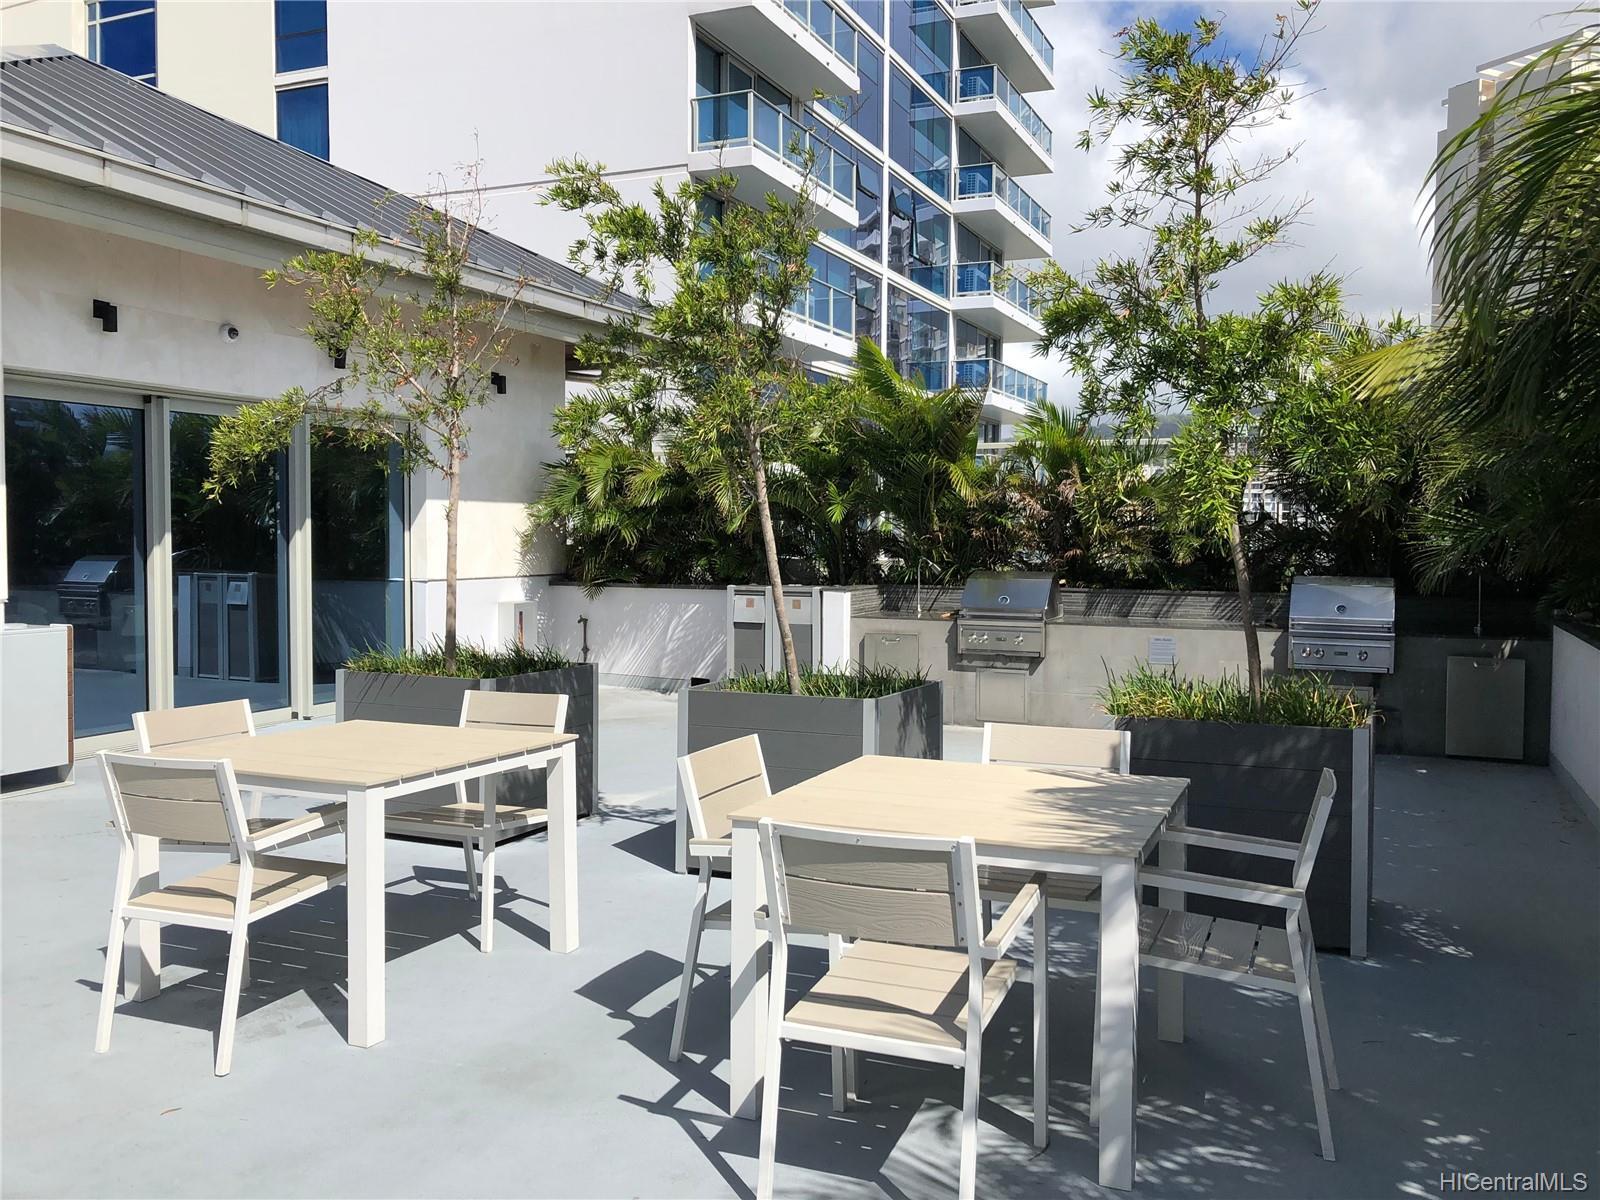 1631 Kapiolani Blvd Honolulu - Rental - photo 15 of 20